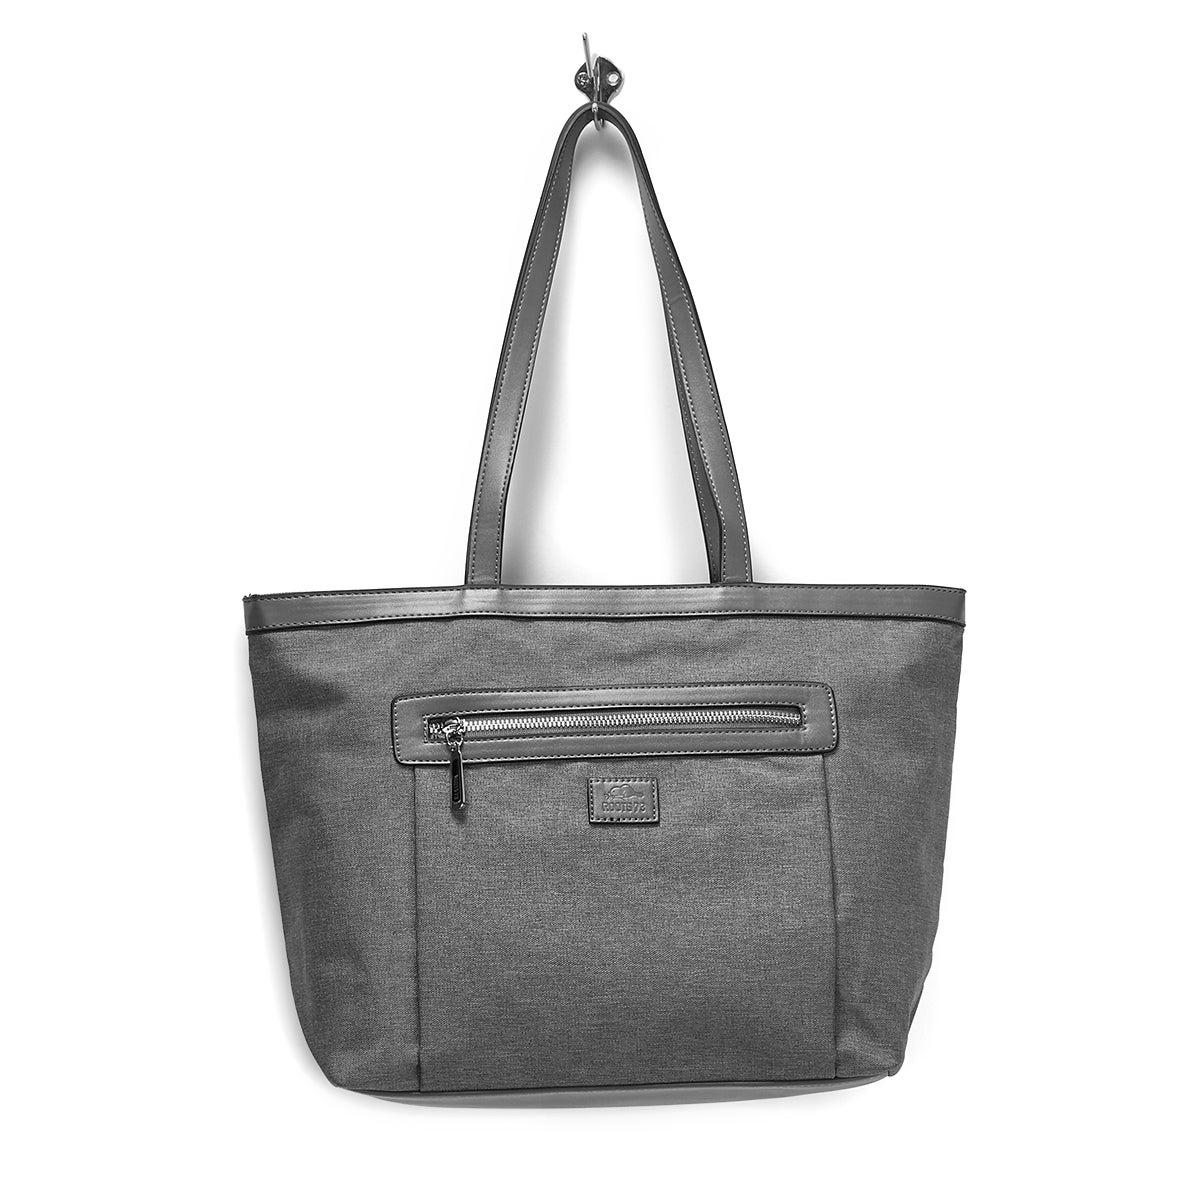 LdsRoots73 grey top zip small tote bag